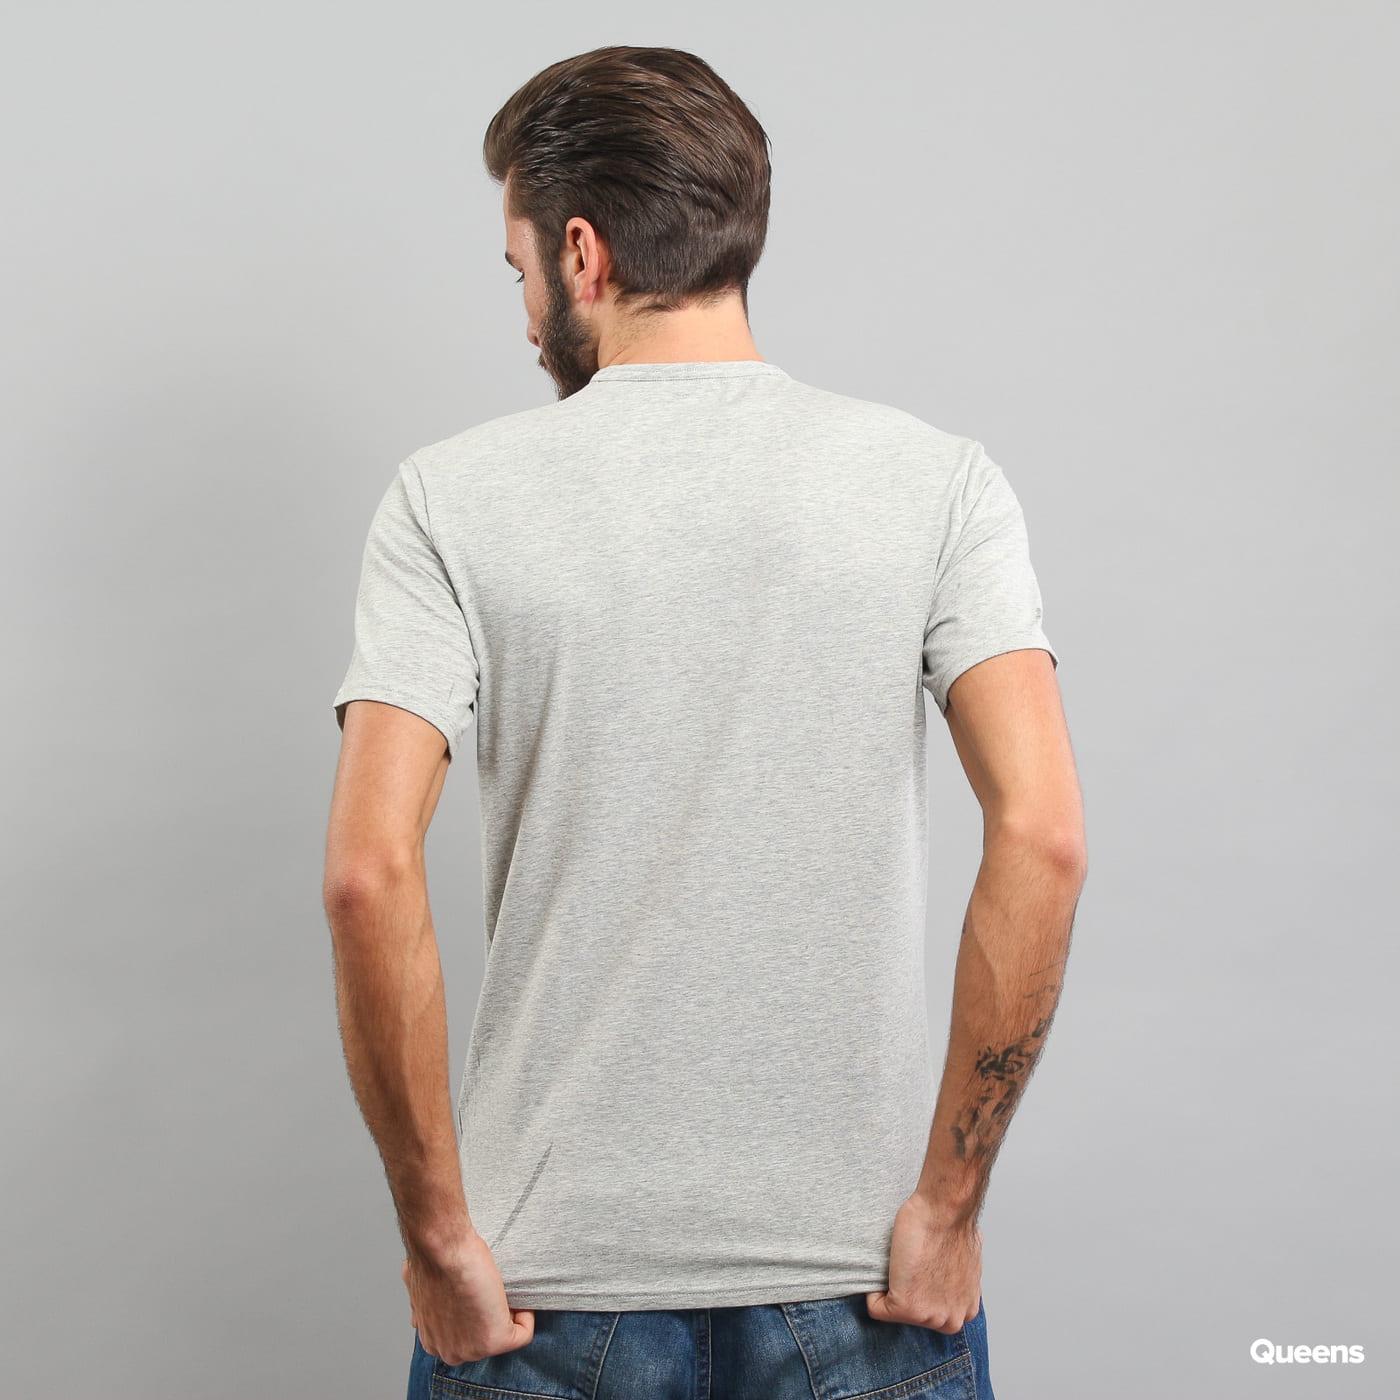 Calvin Klein S/S Crew Neck melange šedé